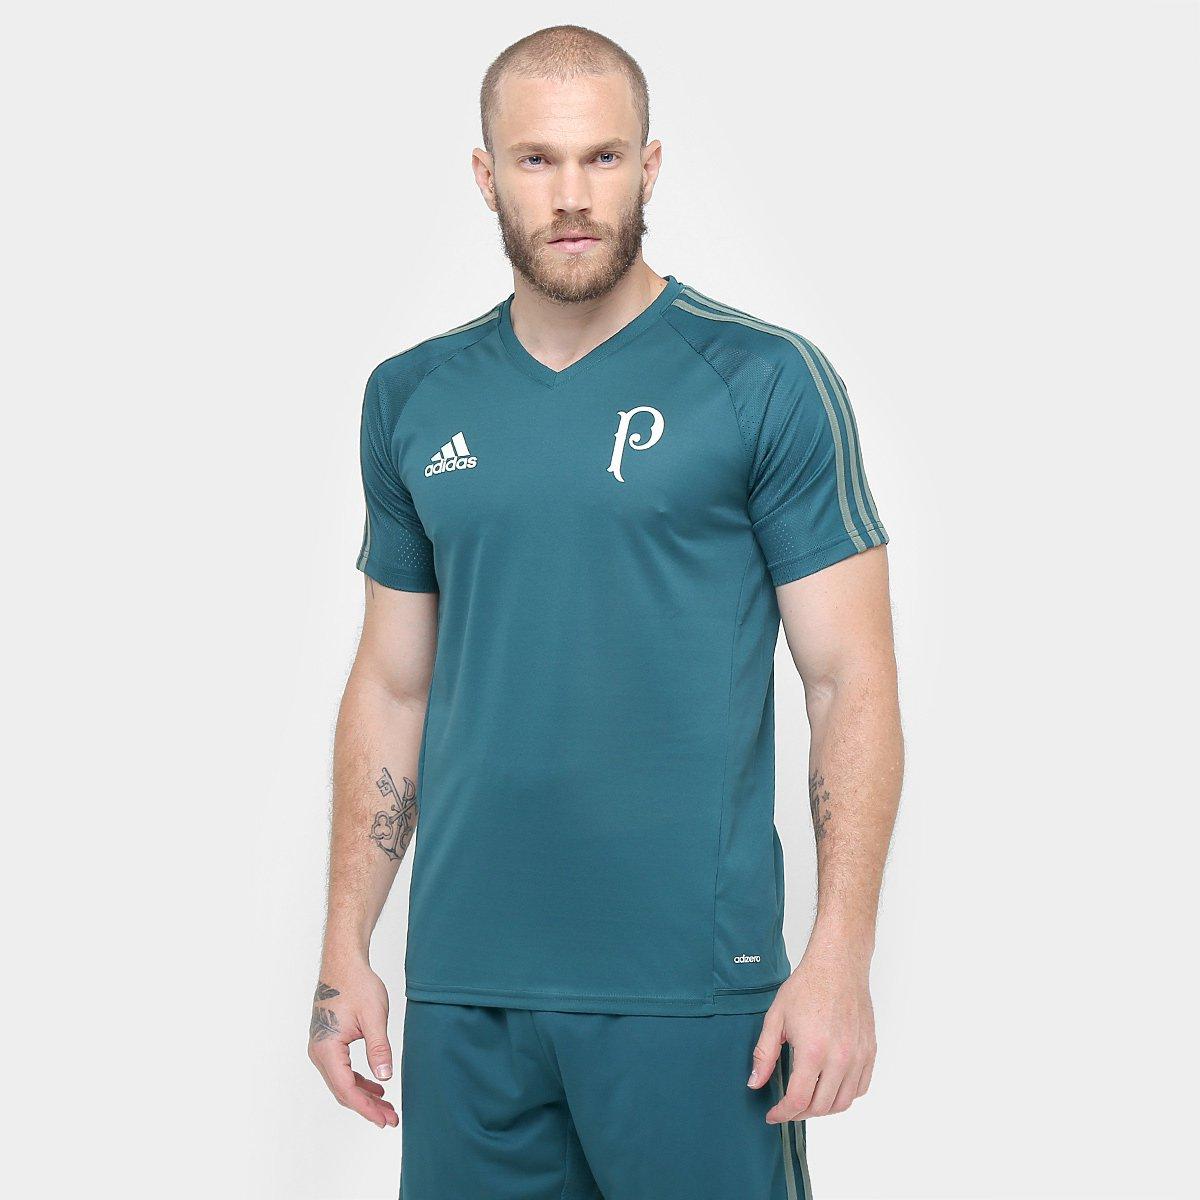 57bc80ac45bc0 Camisa Palmeiras 17/18 Treino Adidas Masculina | Allianz Parque Shop